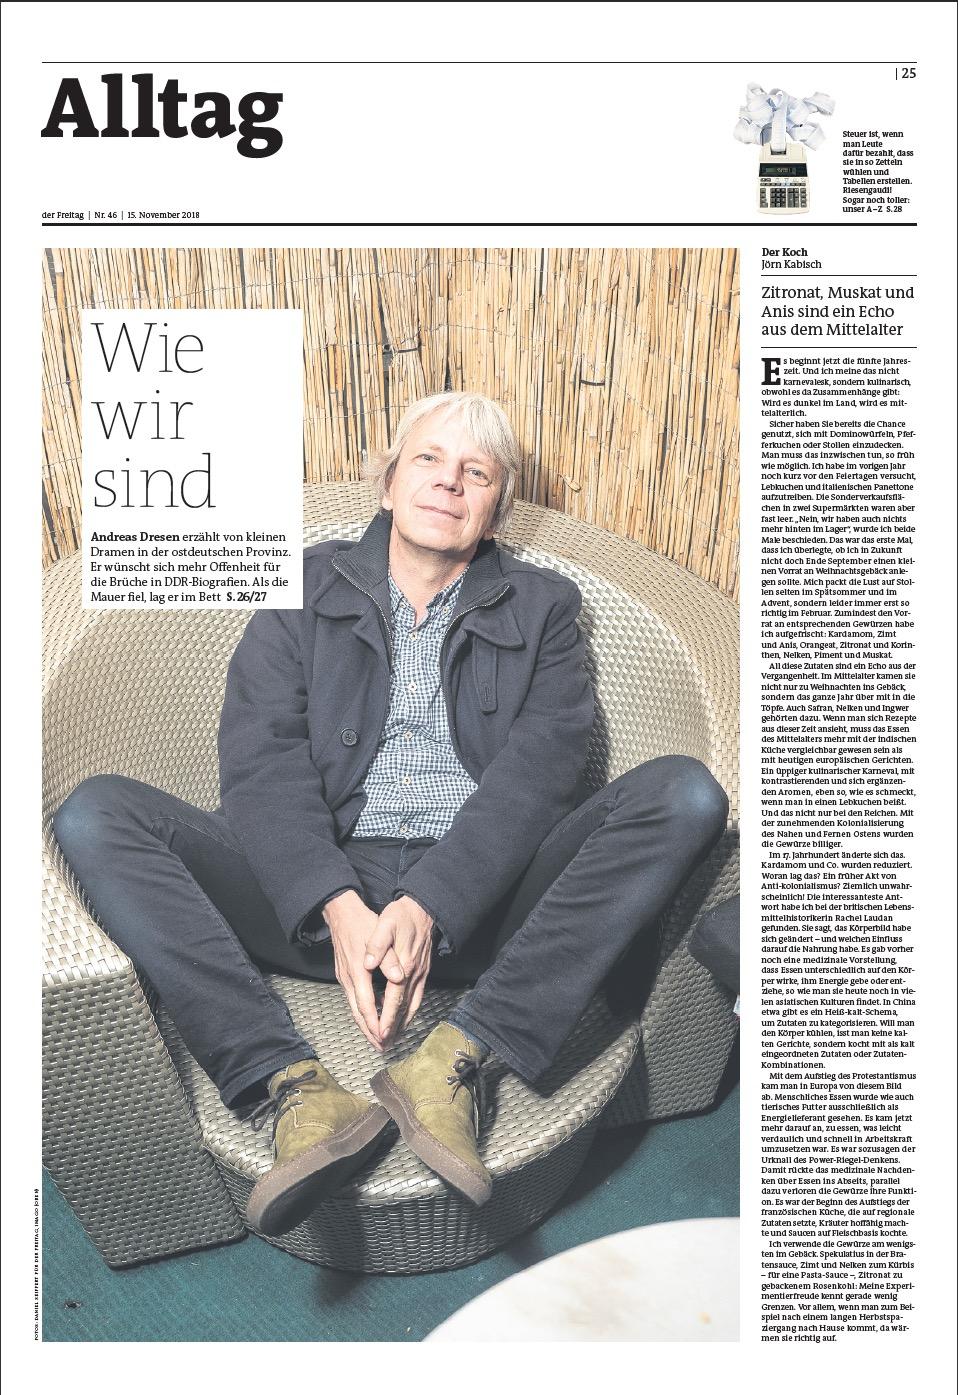 Andreas Dresen - Portrait um 11.58.53.jpg